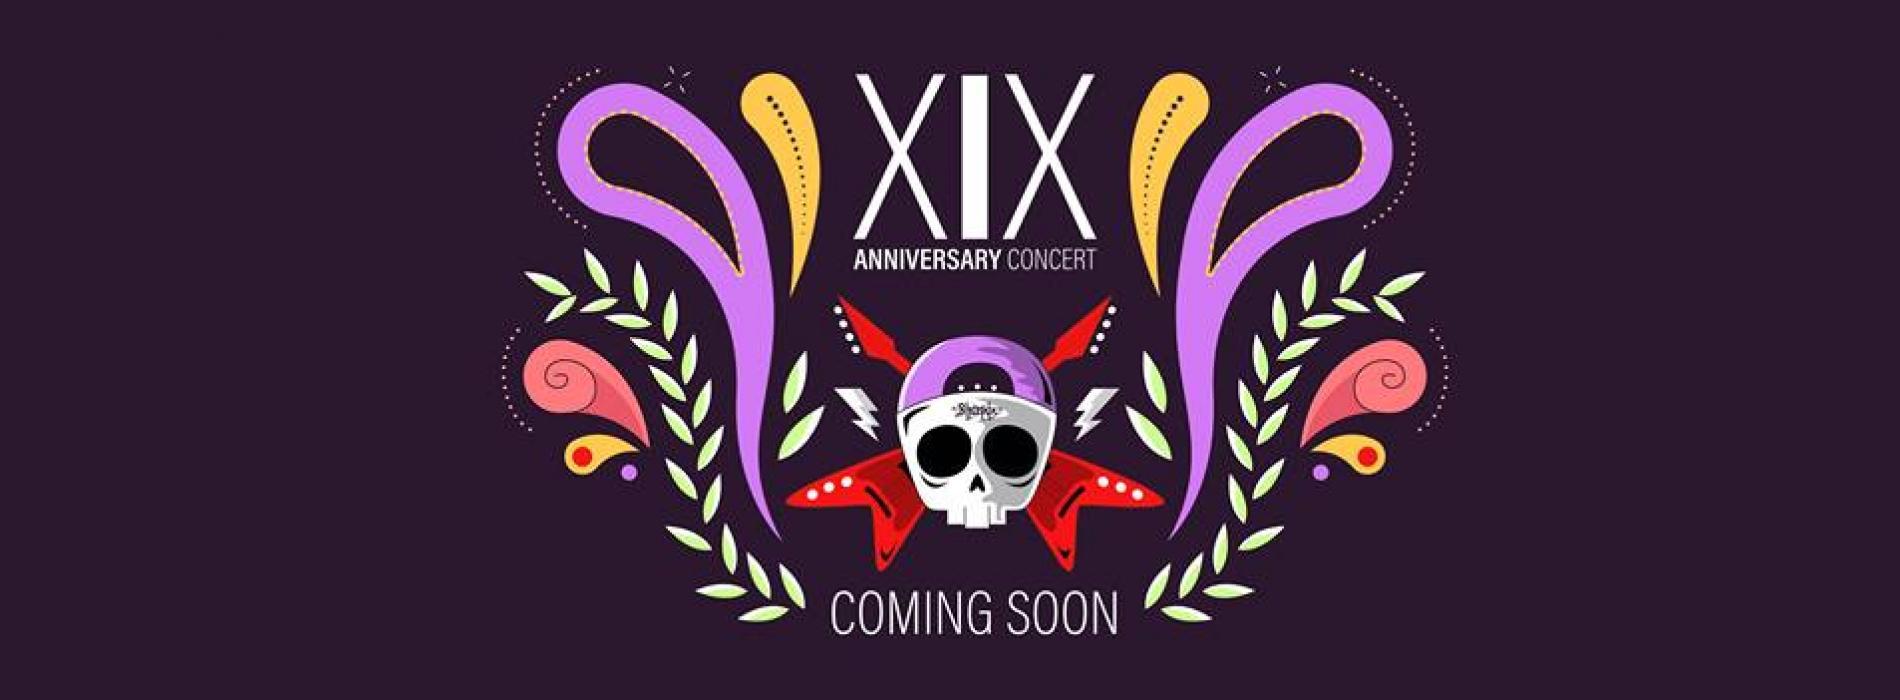 XIX – Stigmata Celebrating 19 Years Of Pure Sri Lankan Metal